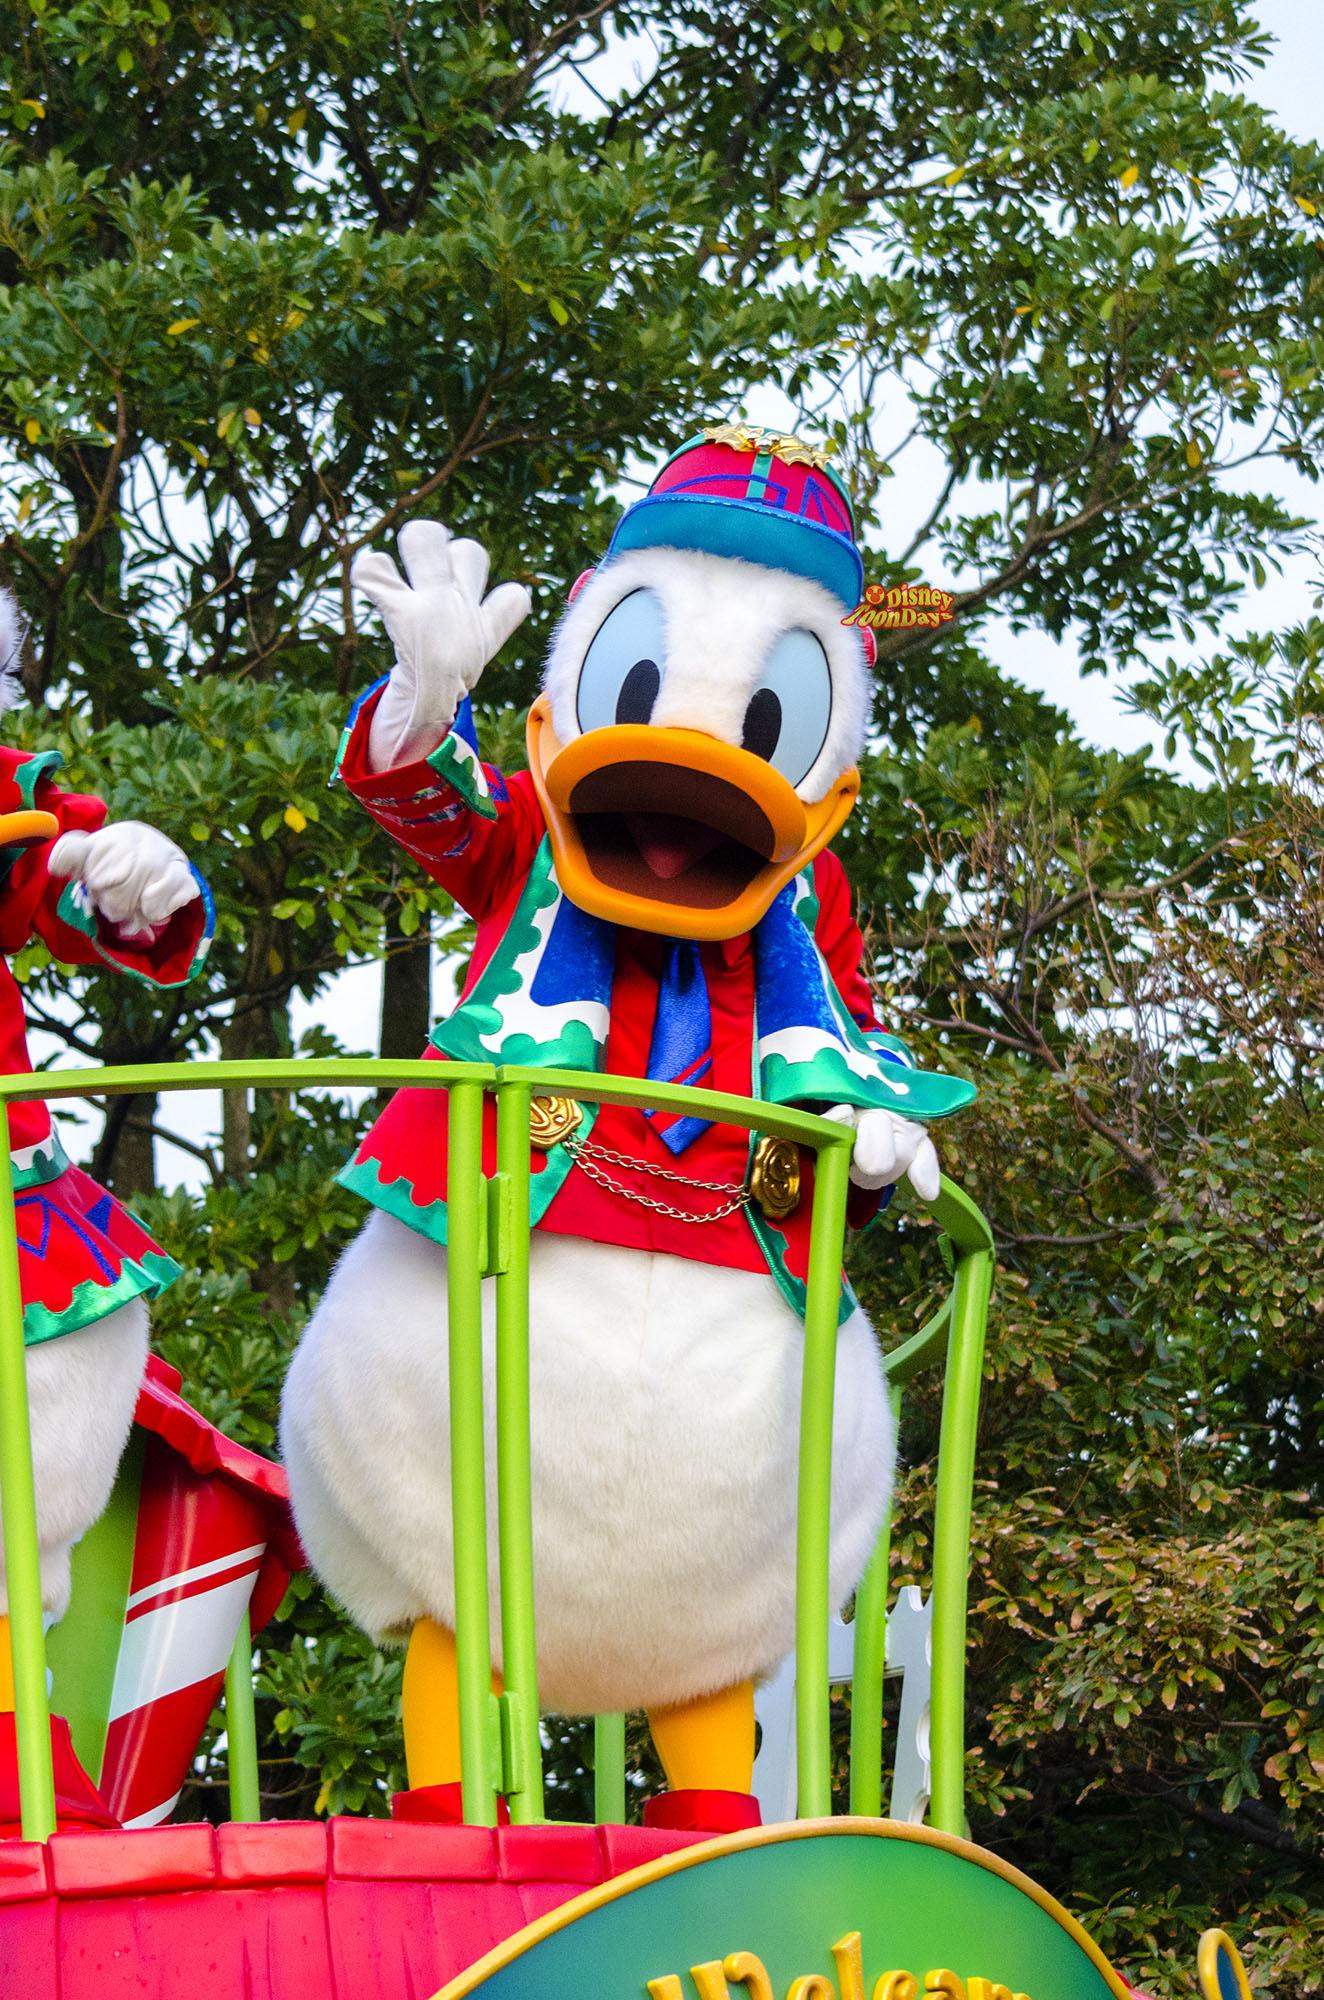 TDL クリスマス・ファンタジー ディズニーサンタヴィレッジパレード ドナルドダック